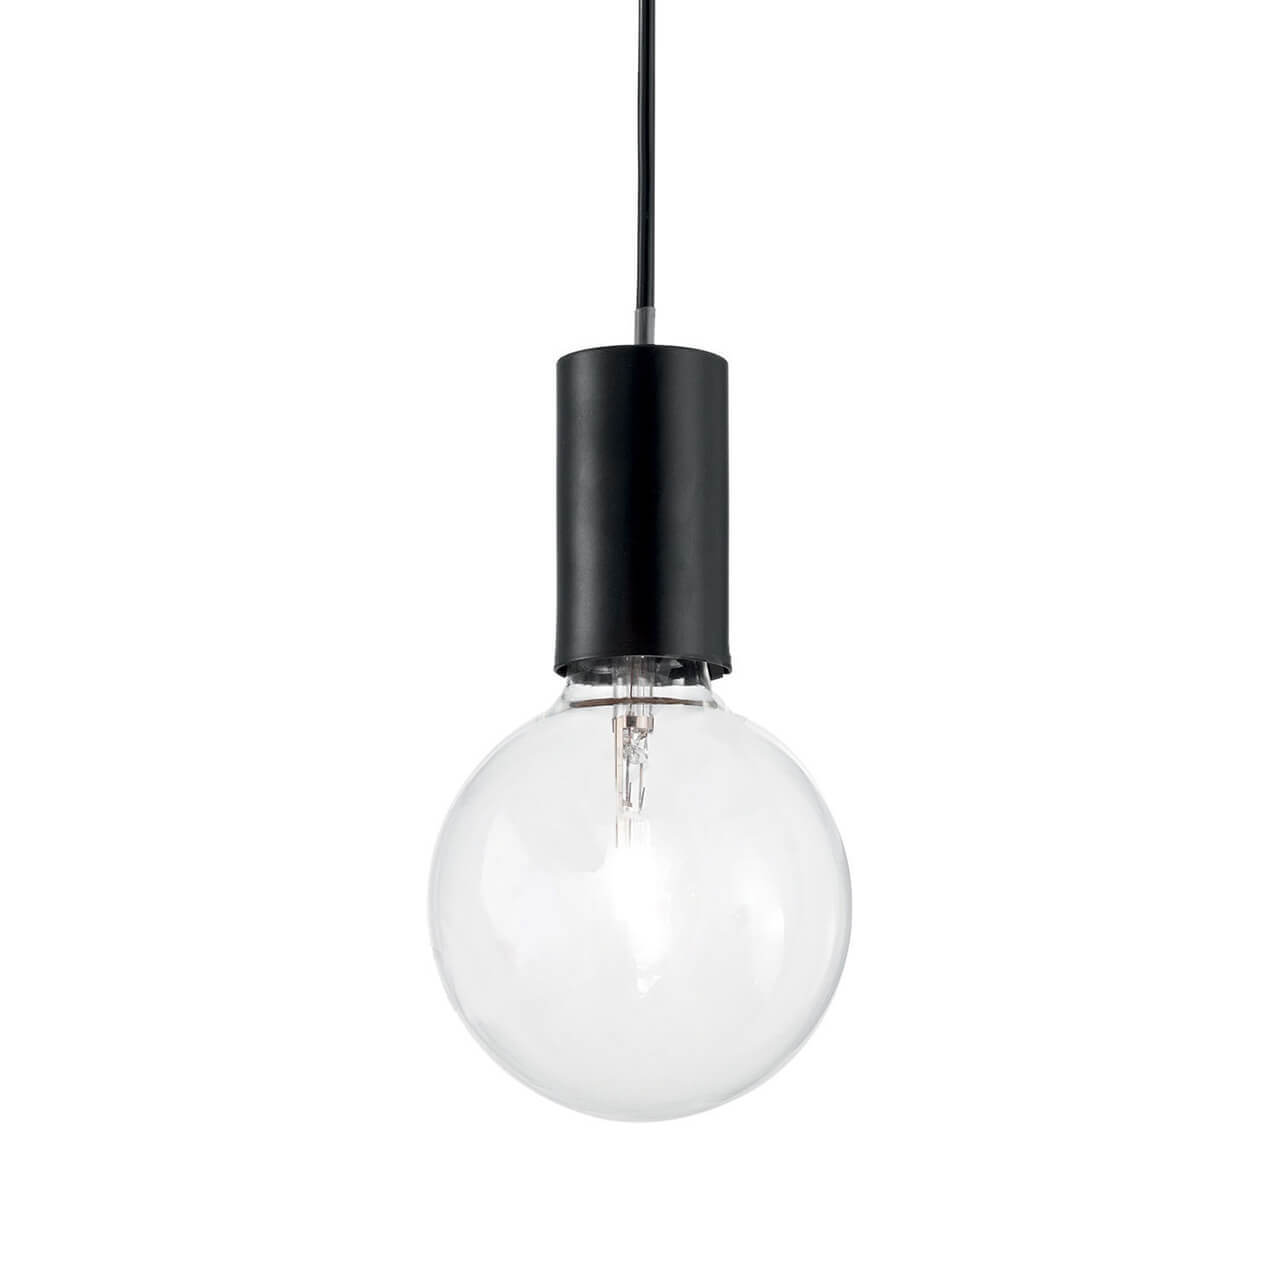 Светильник Ideal Lux Hugo Sp1 Hugo Nero подвесной светильник ideal lux wheel sp3 009681